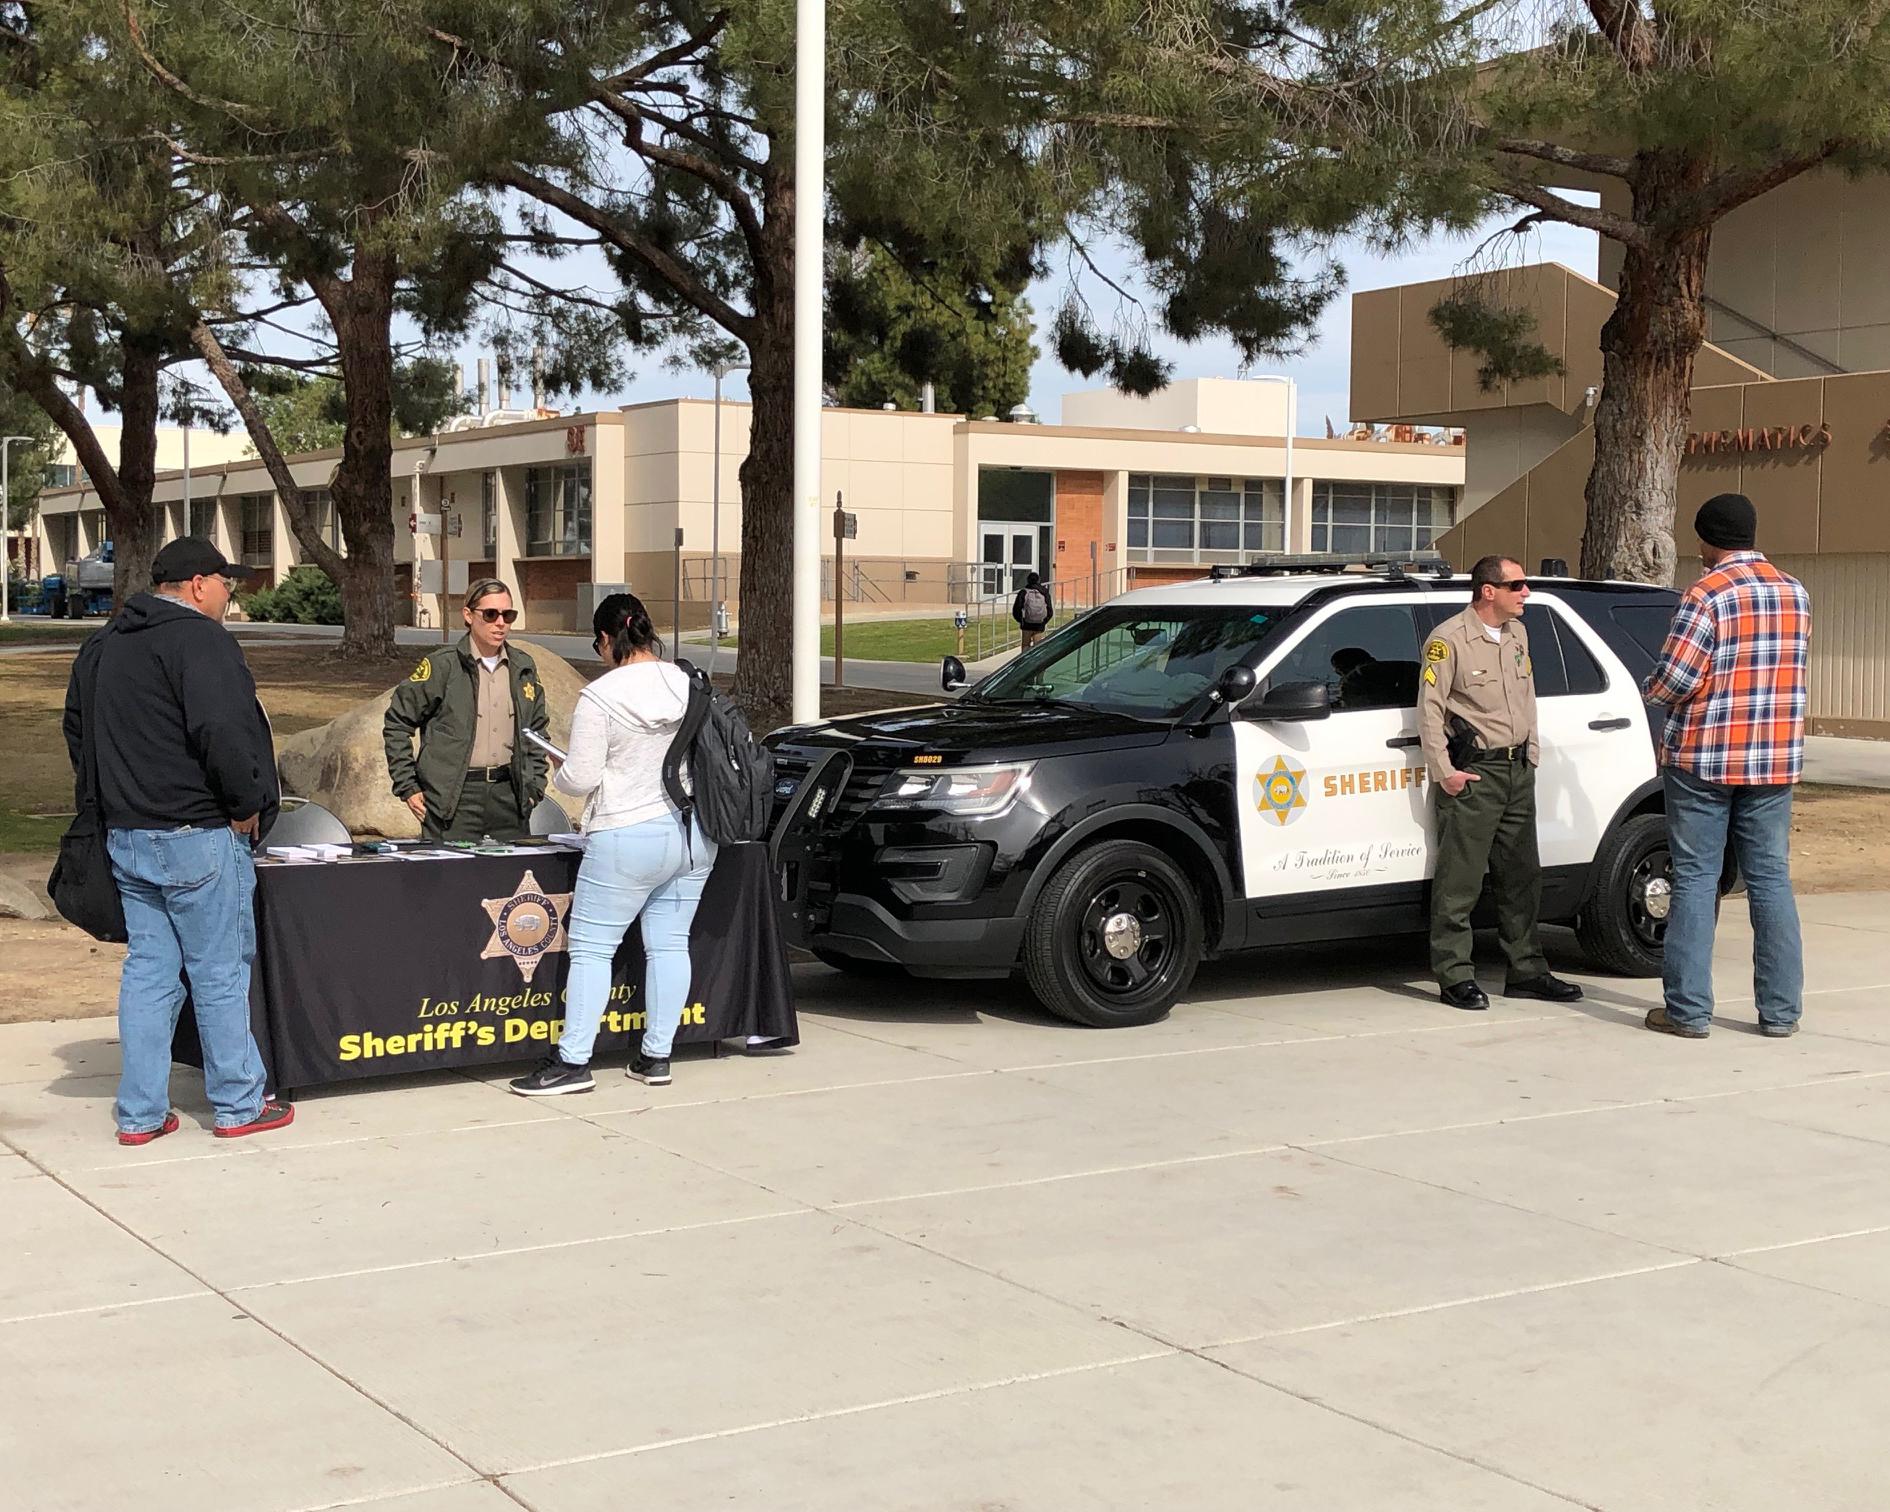 LA Sheriff Department